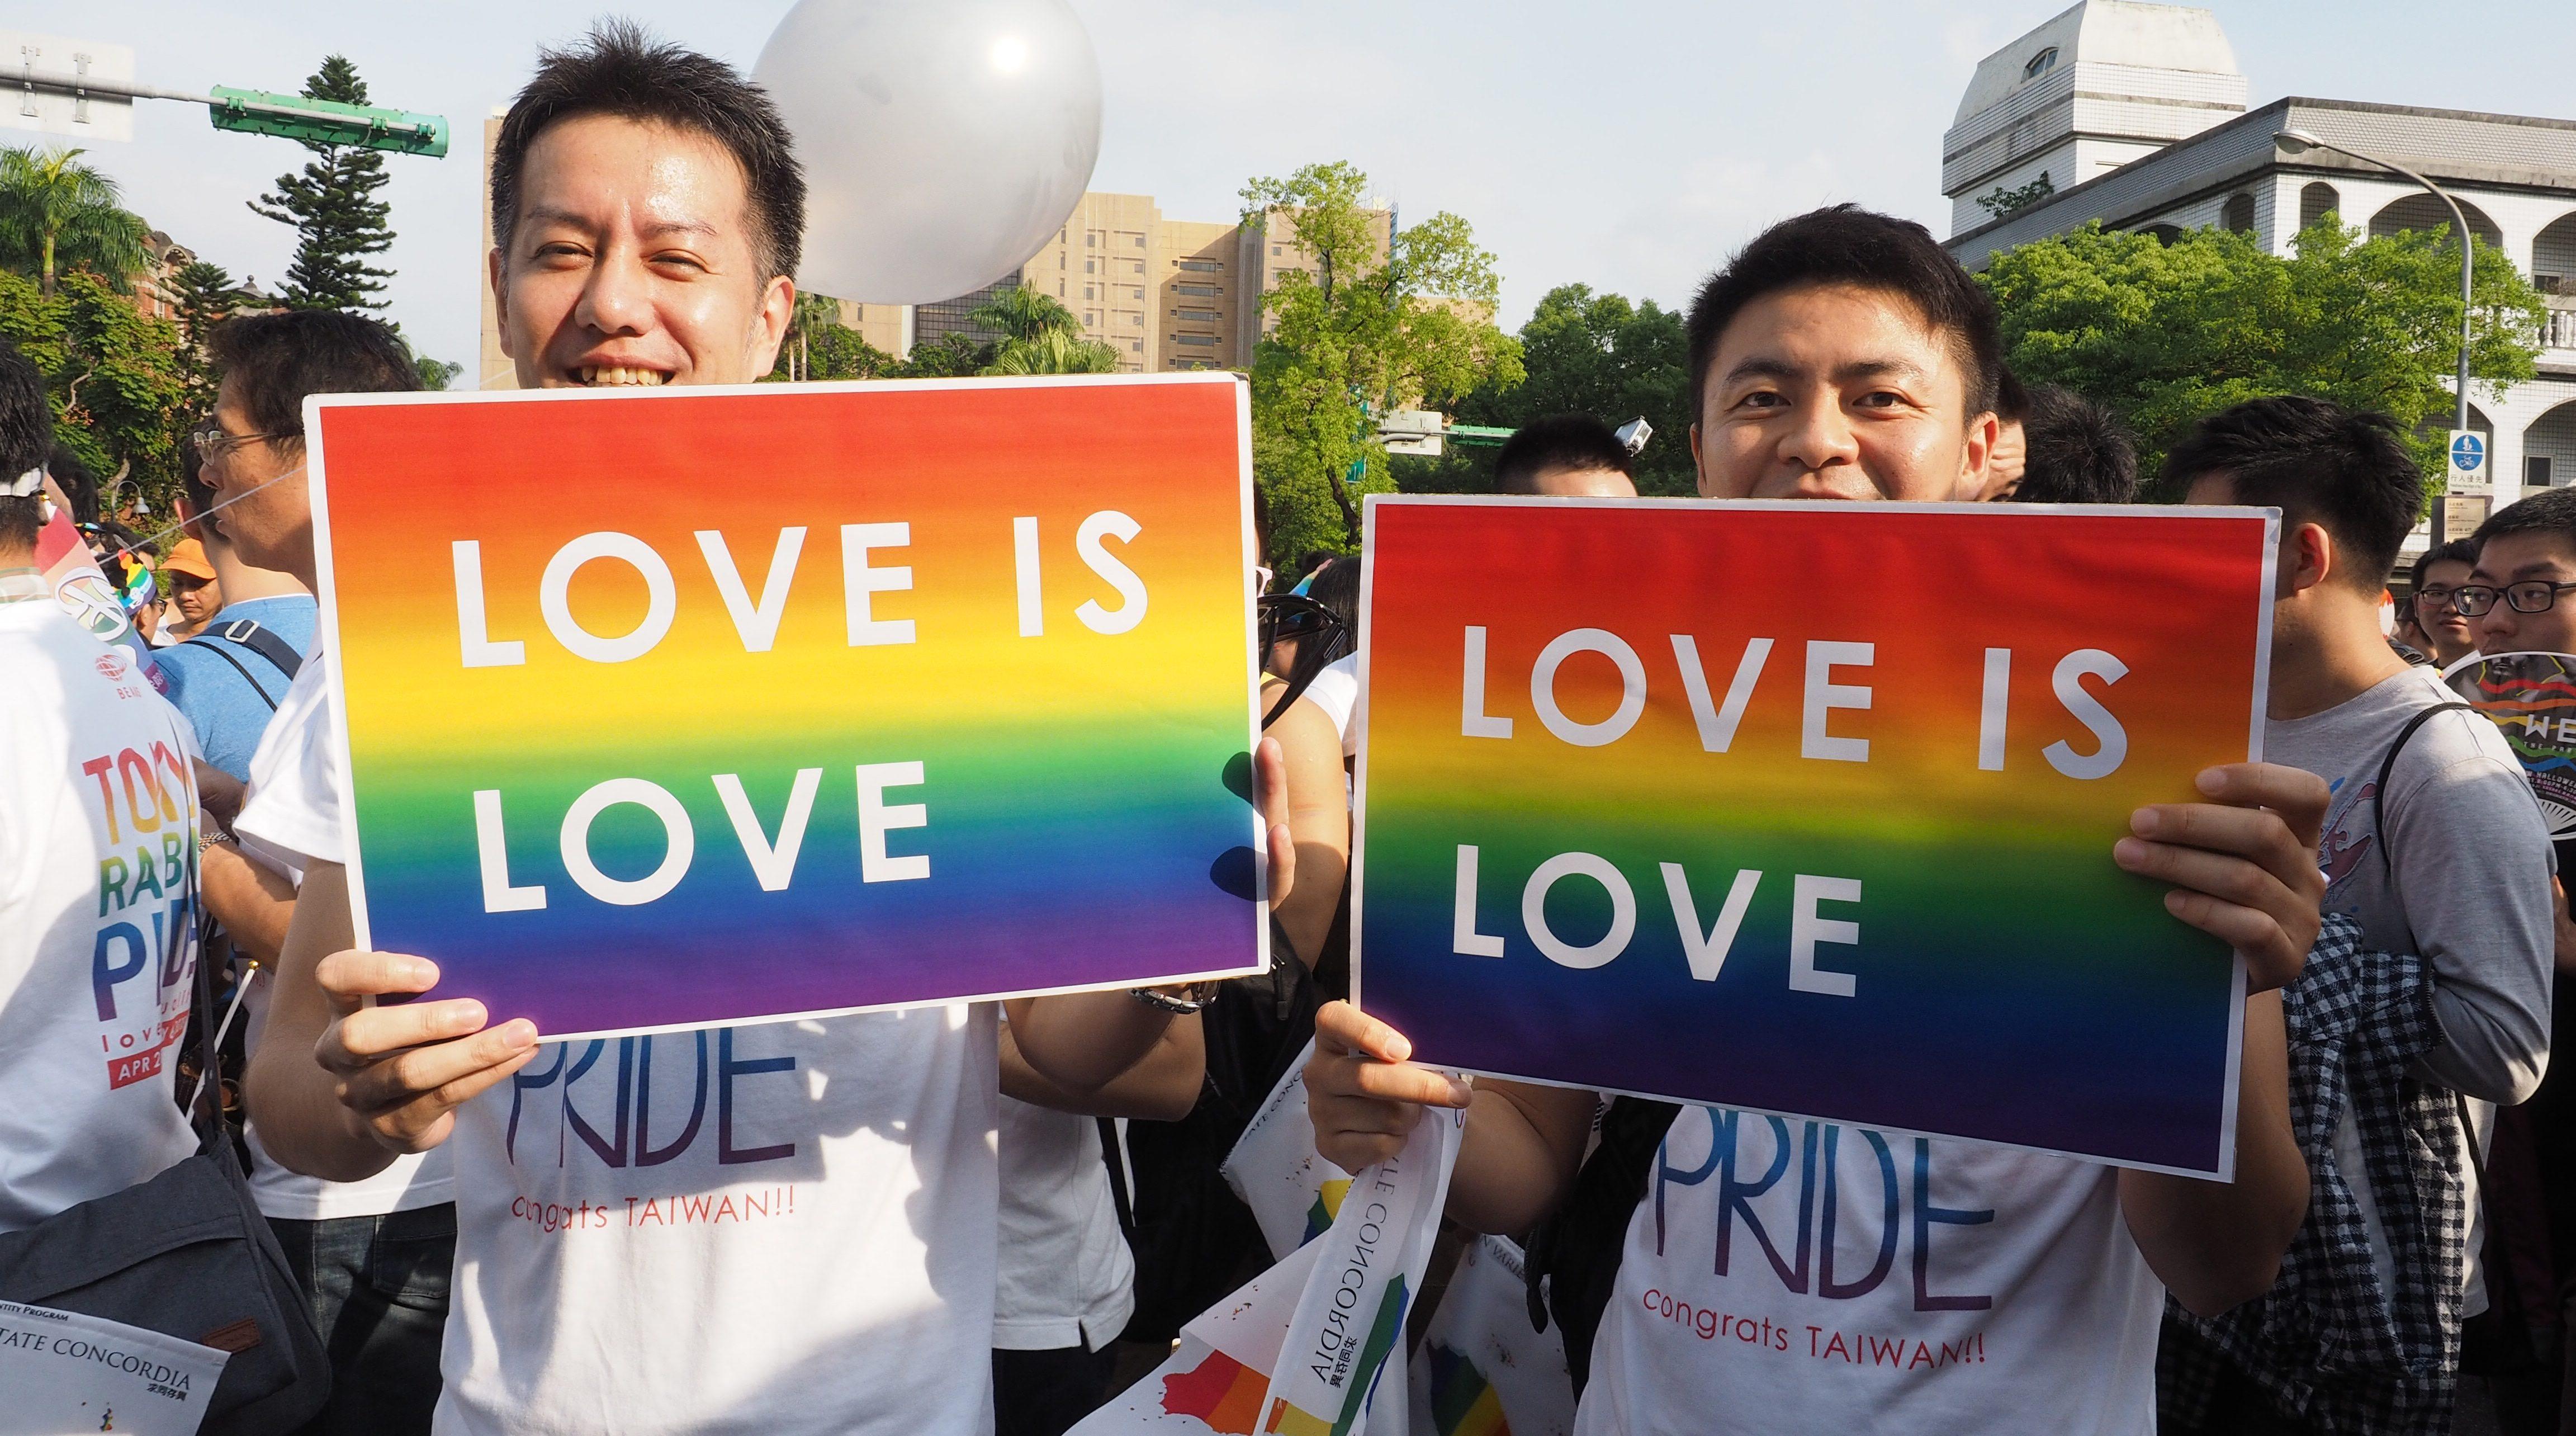 2017 Taipei Gay Pride March